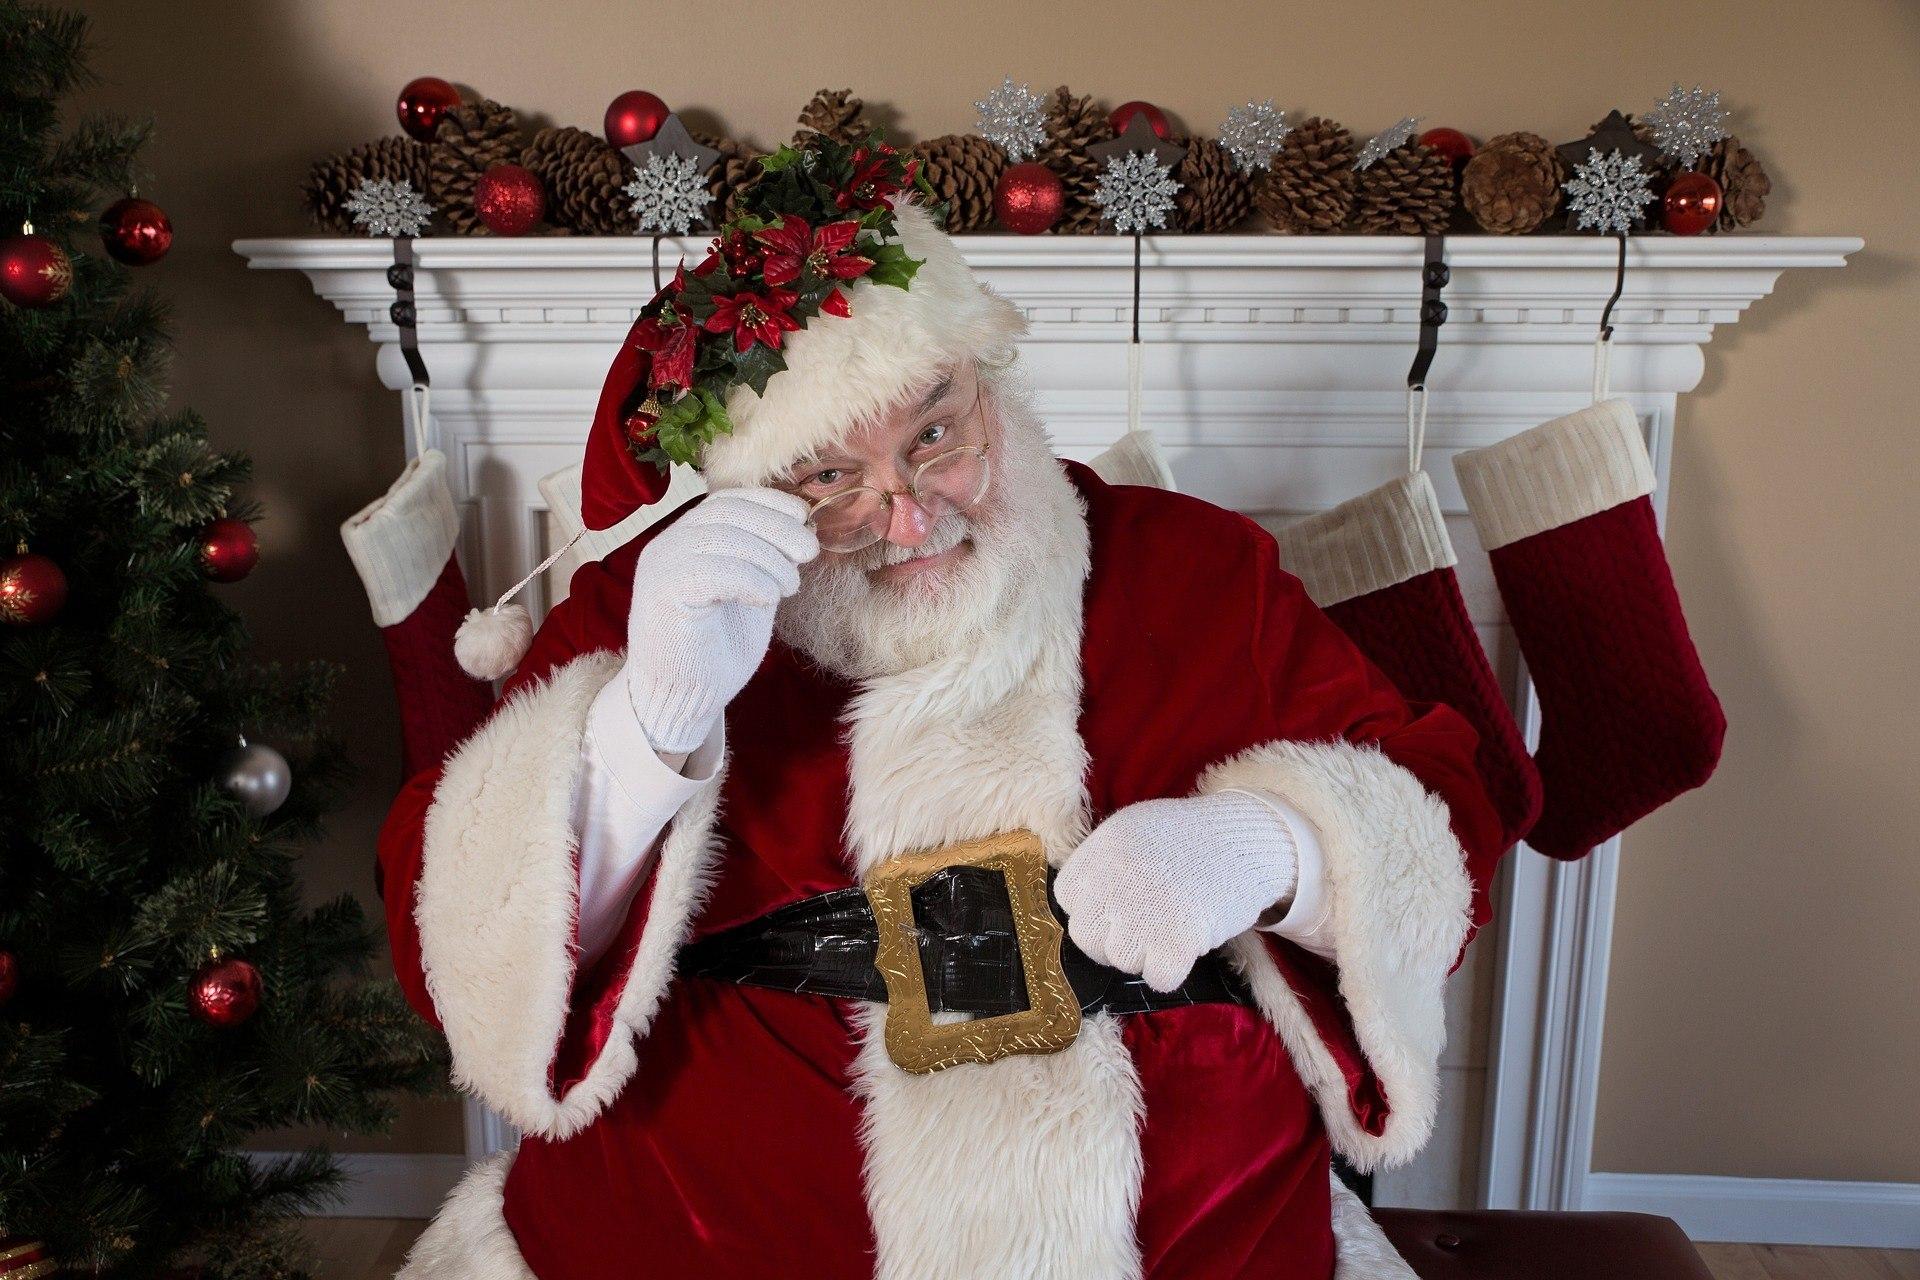 Dear Santa: A Last-Minute Swimmer Plea